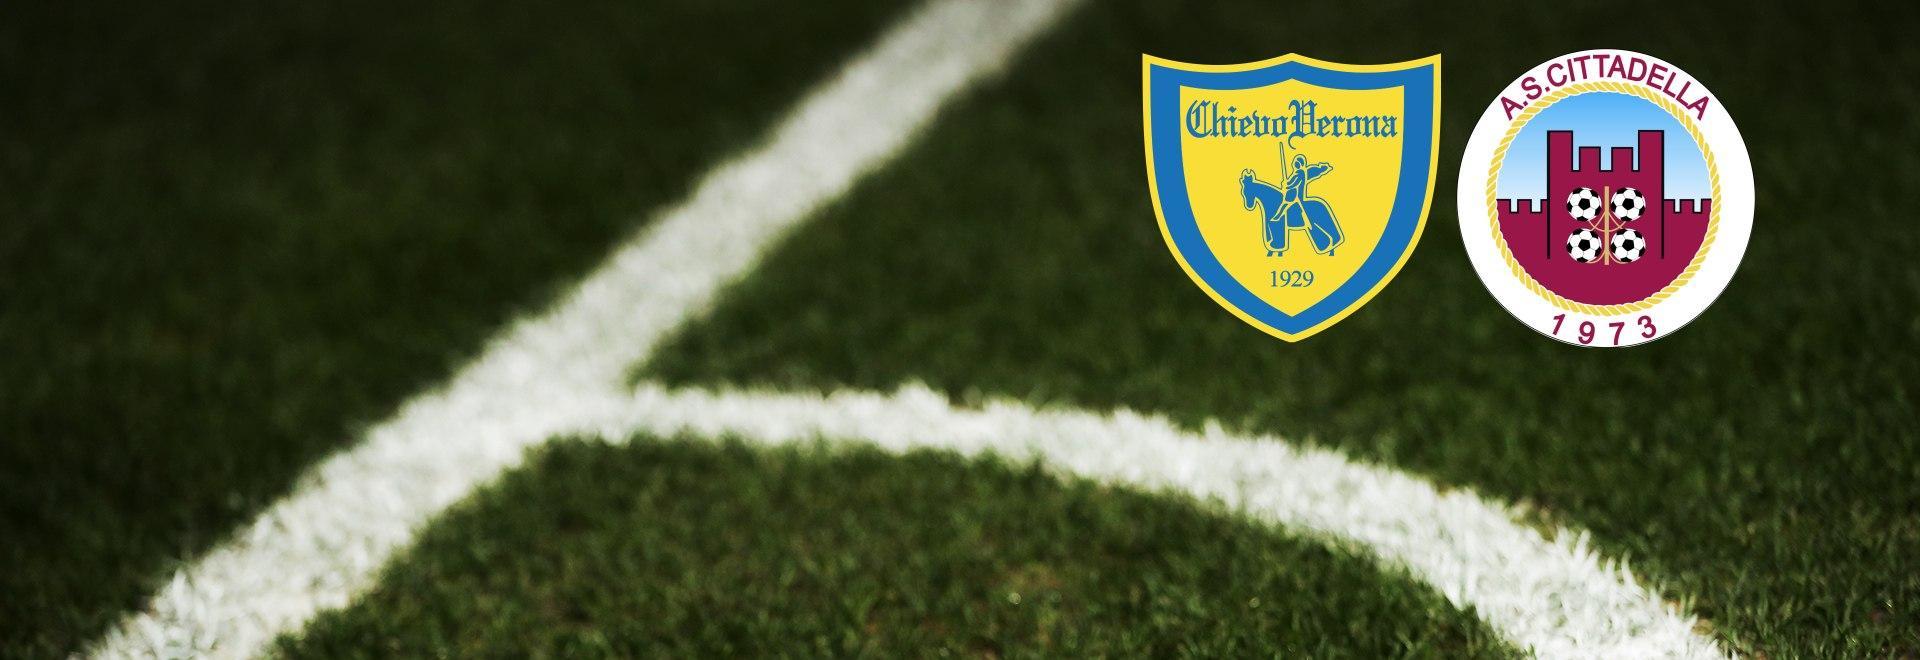 Serie B - stagione 2019